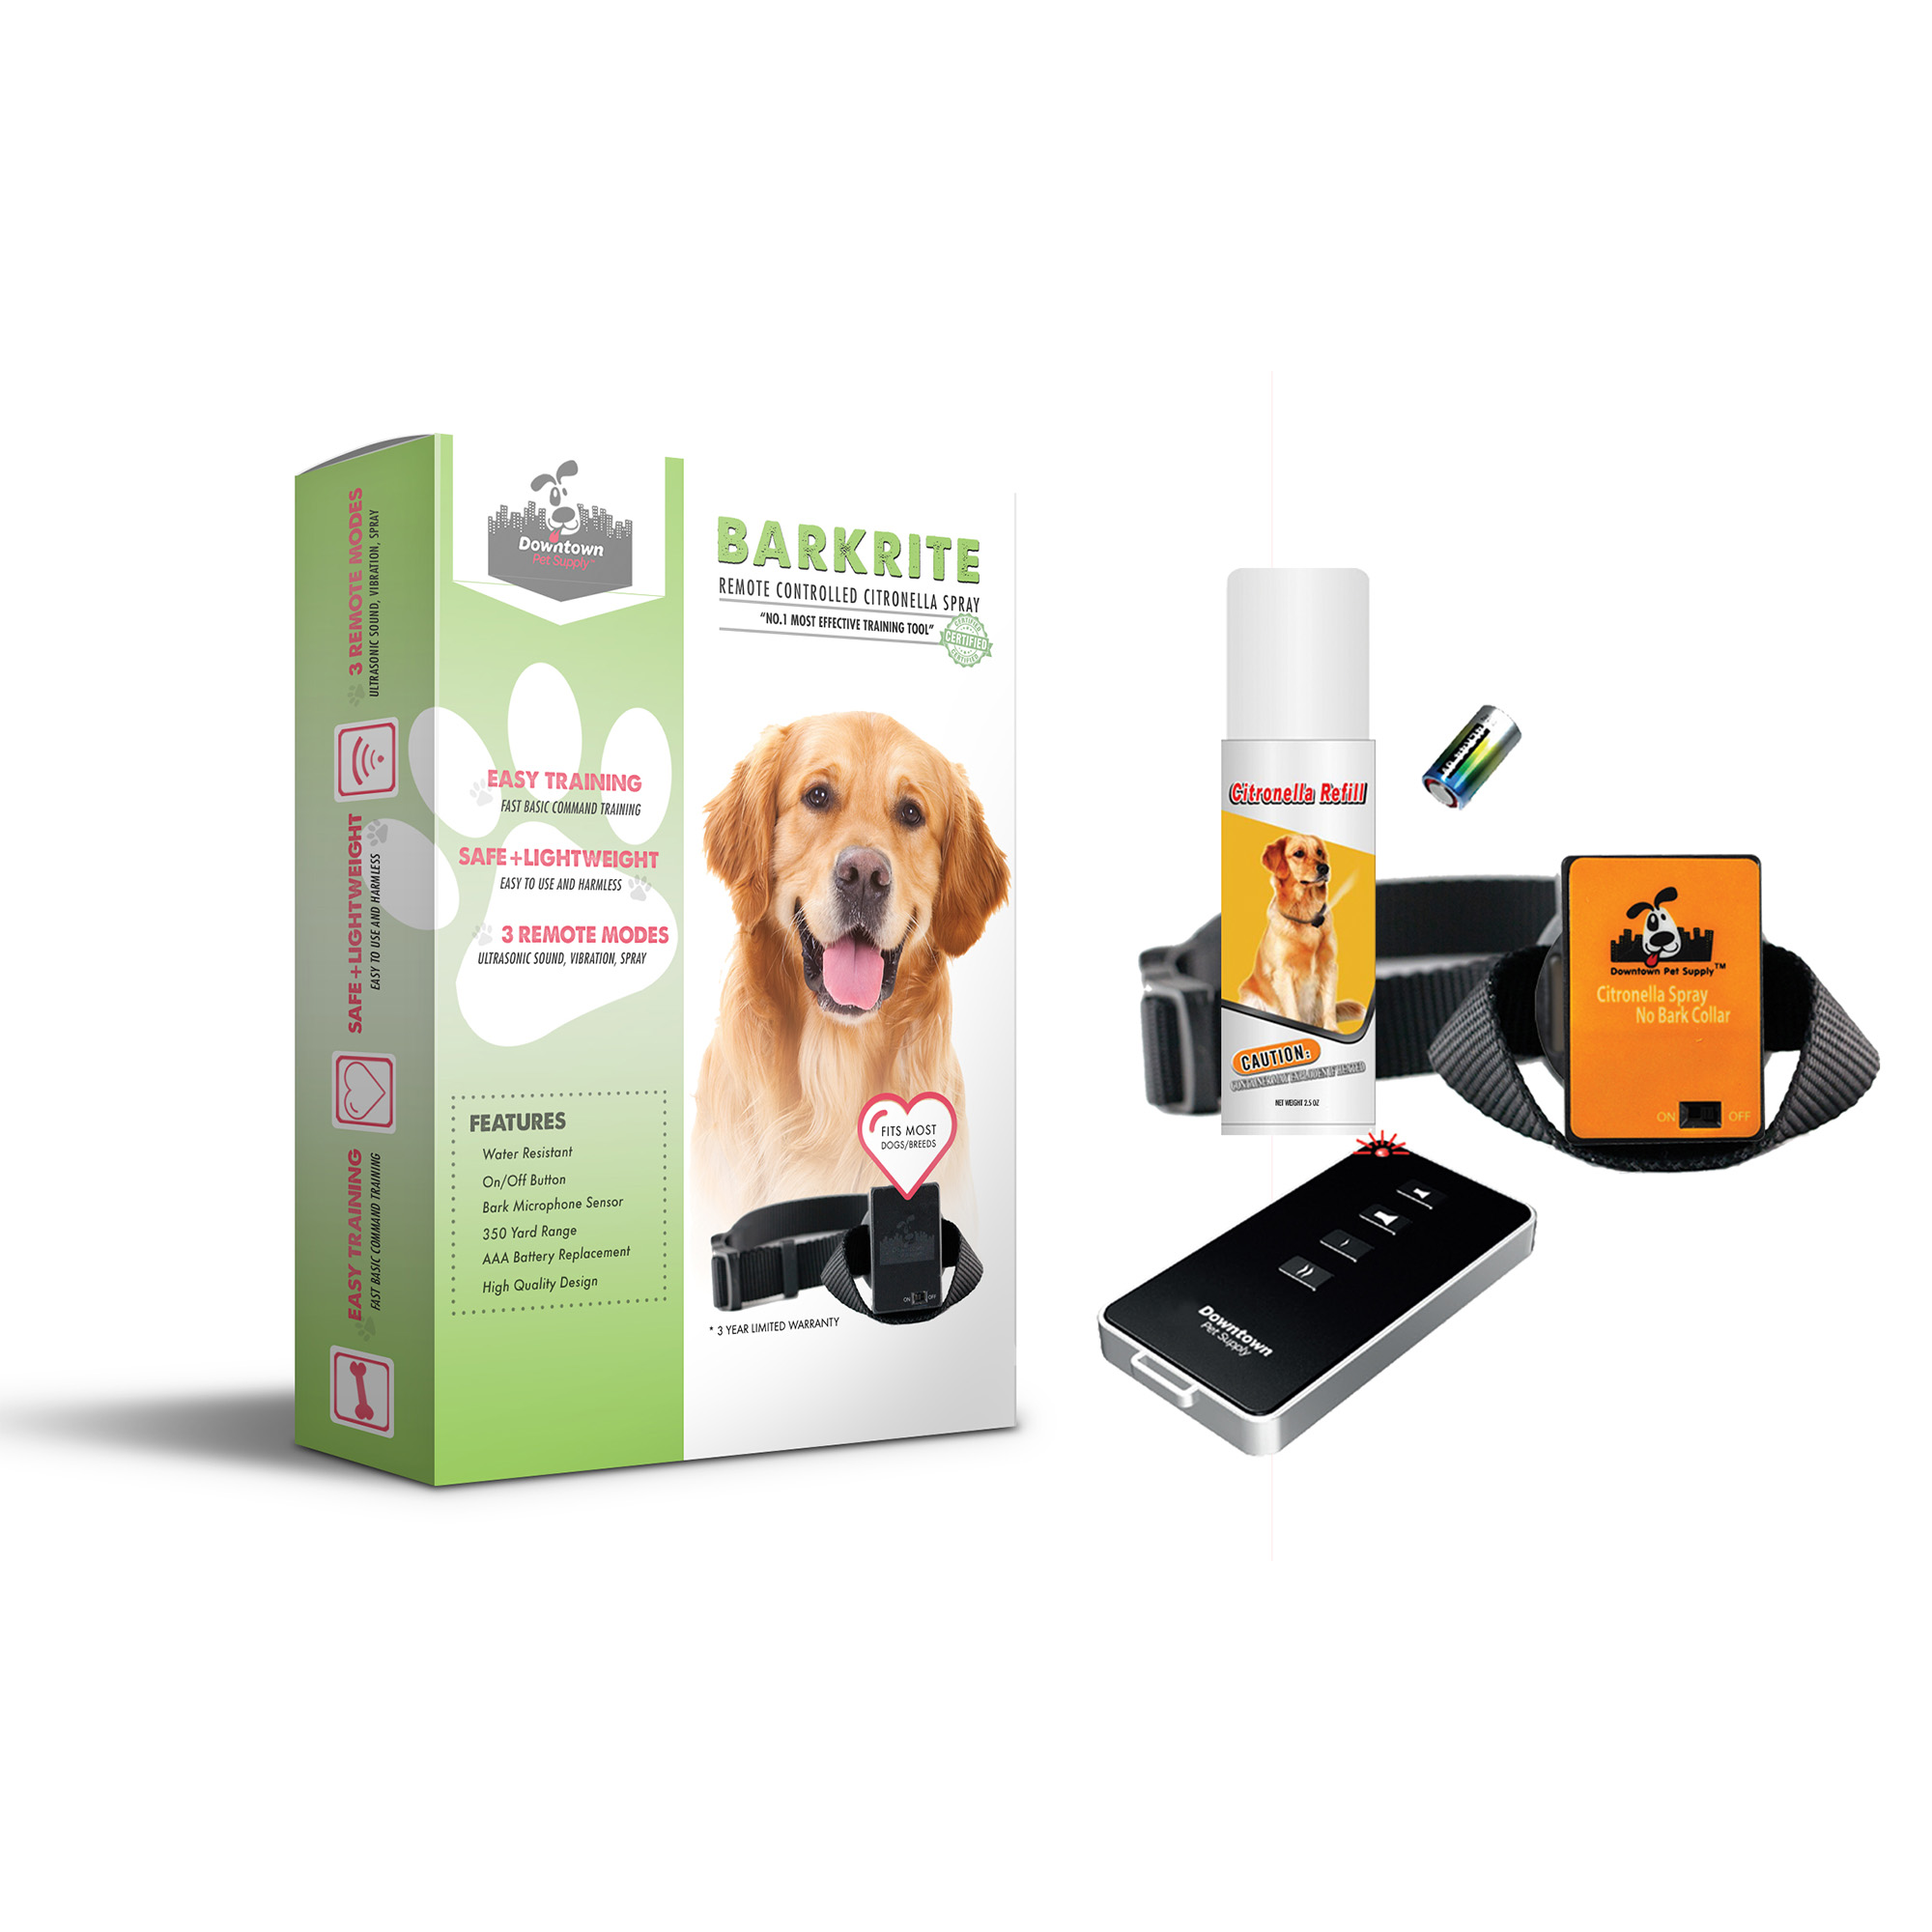 Image Result For E Collar Dog Training Books